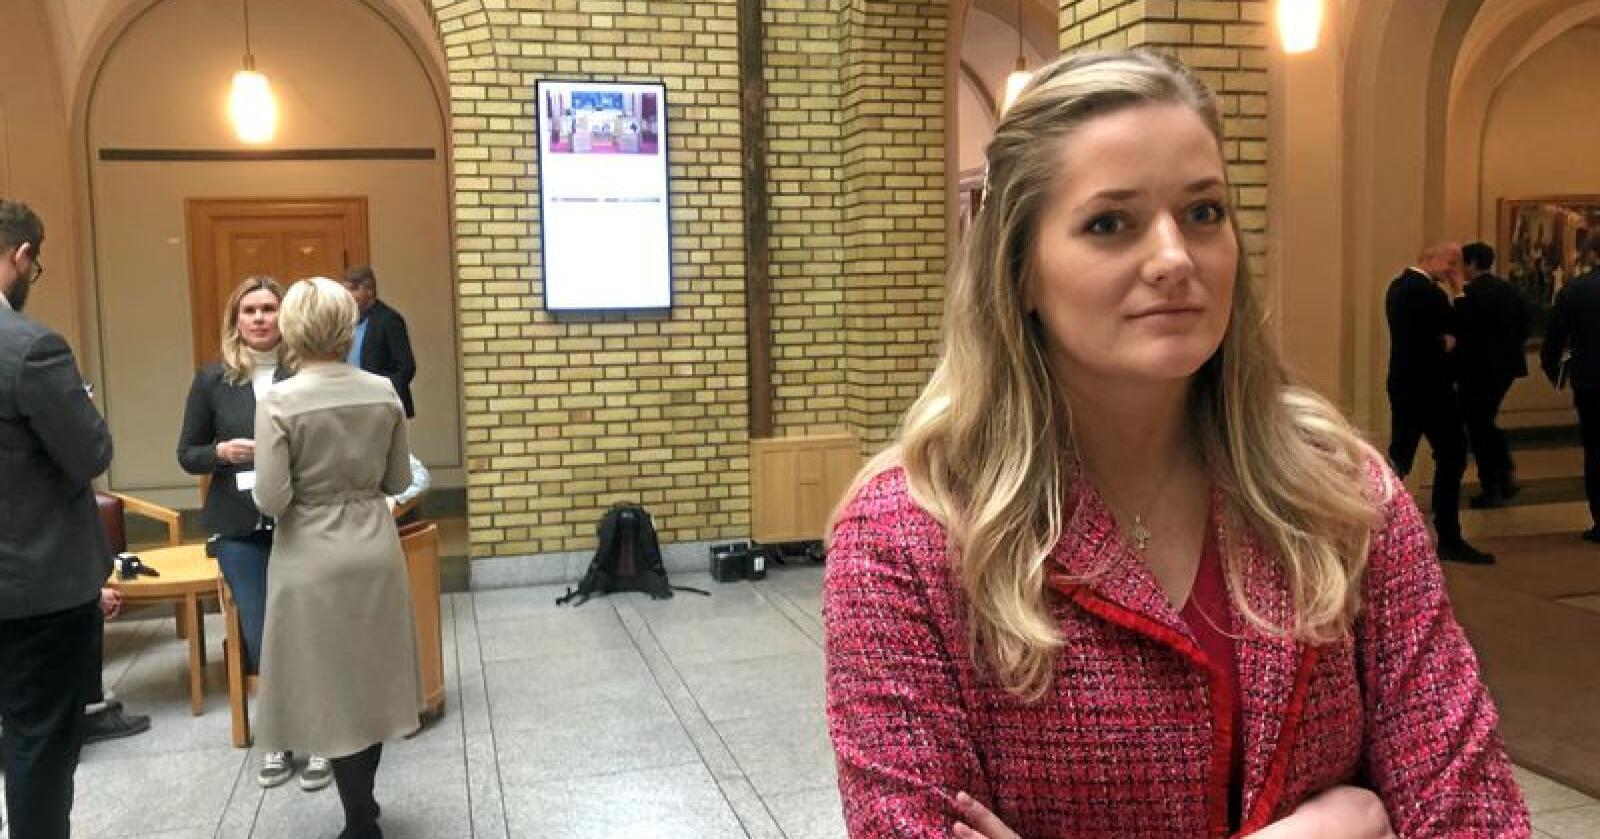 Stortingsrepresentant Emilie Enger Mehl (Sp) mener regjeringen behandler hennes hjemfylke som et ulvereservat. Foto: Sivert Rossing